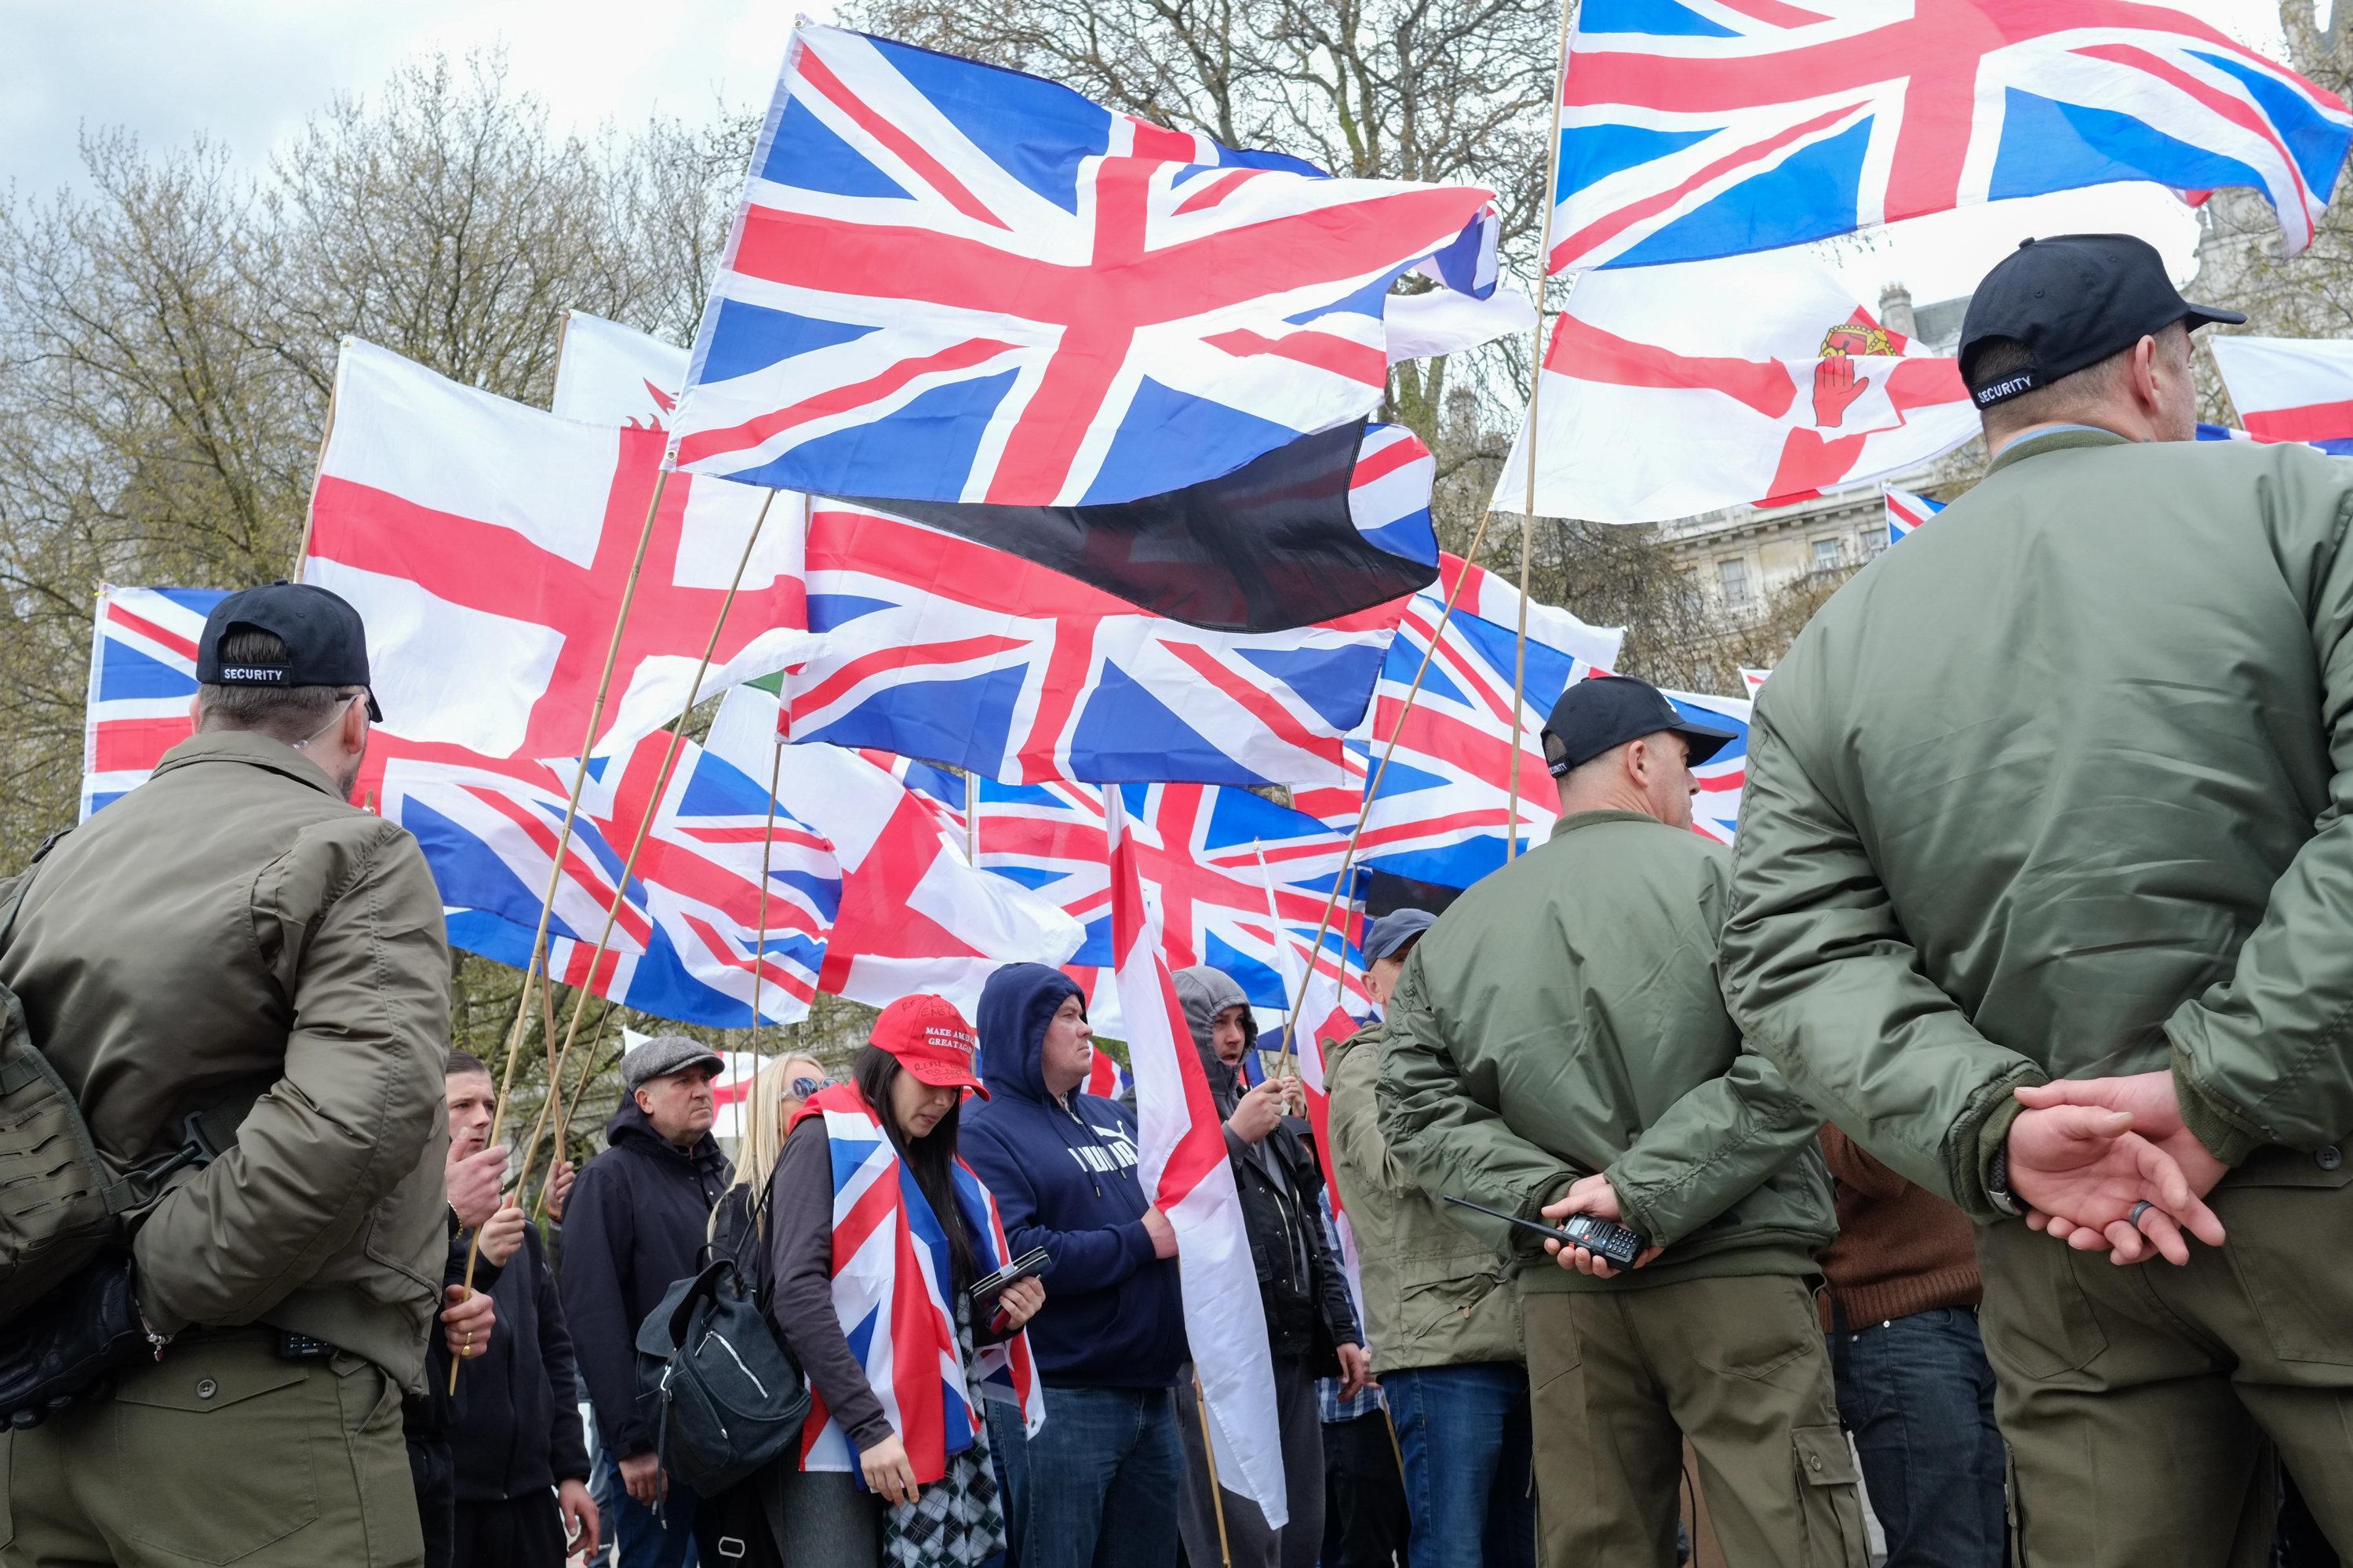 One In Three Terror Suspects In UK Are Far-Right